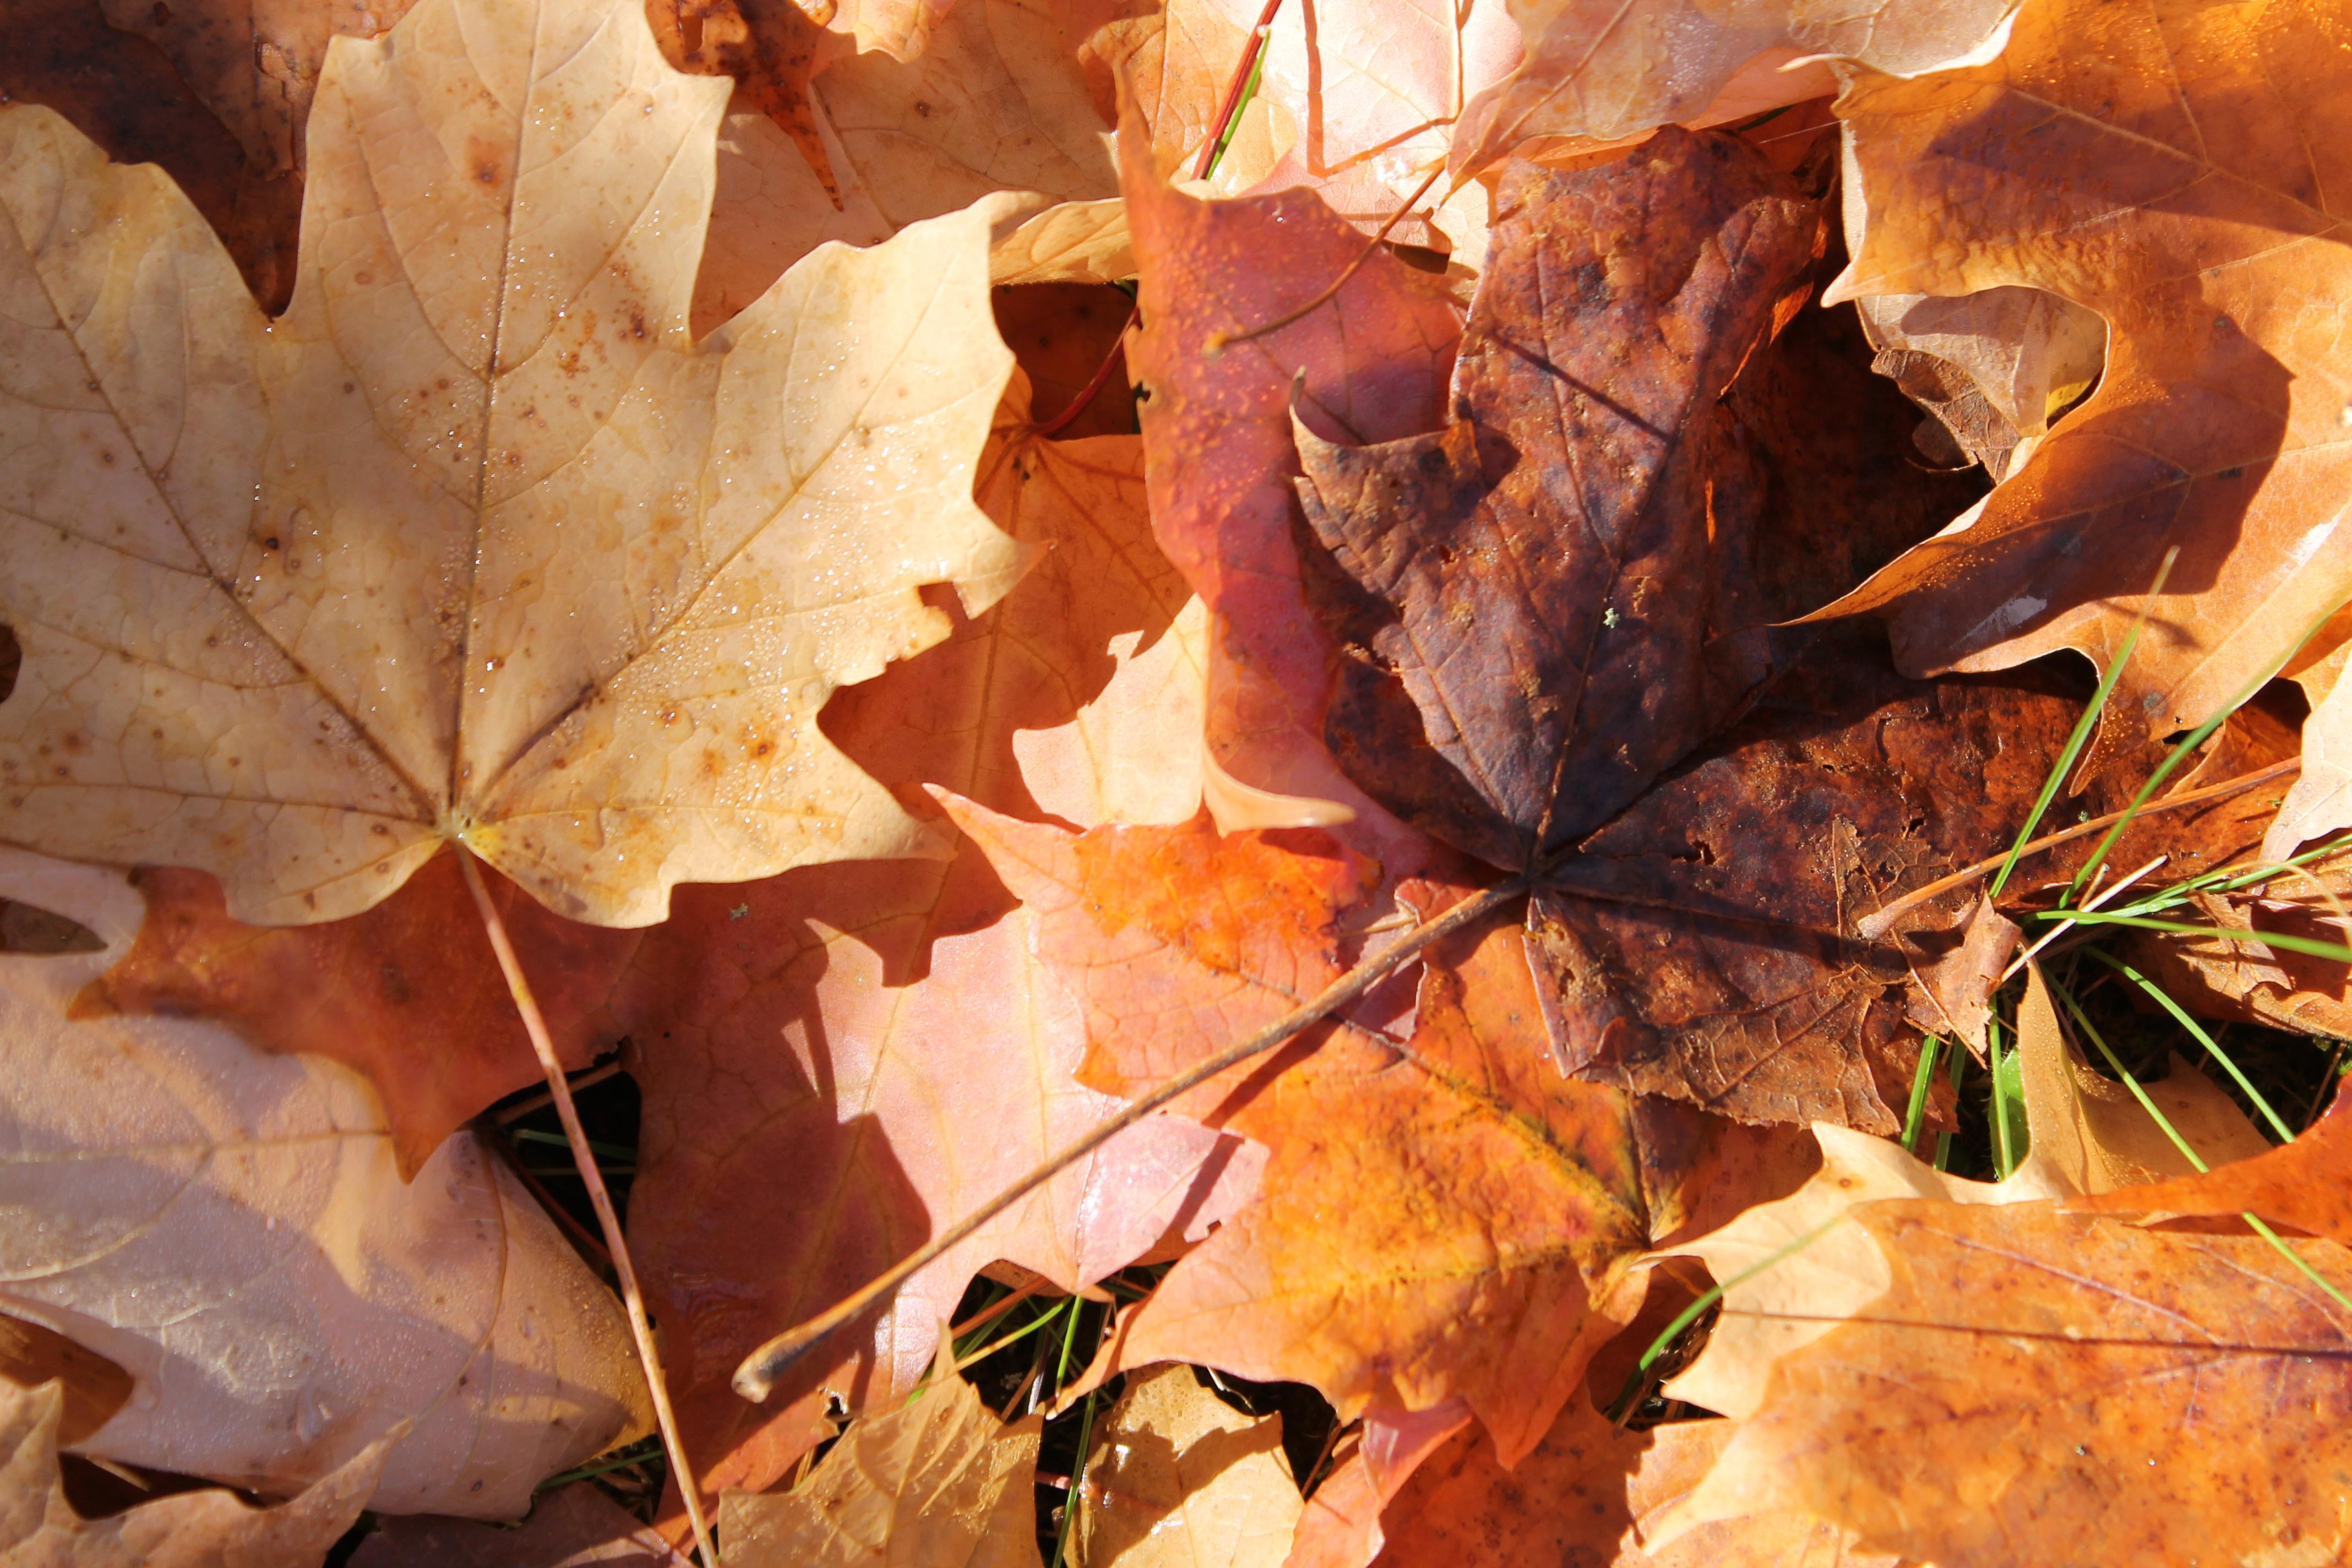 Minnewaska nova iorque fall foliage outono